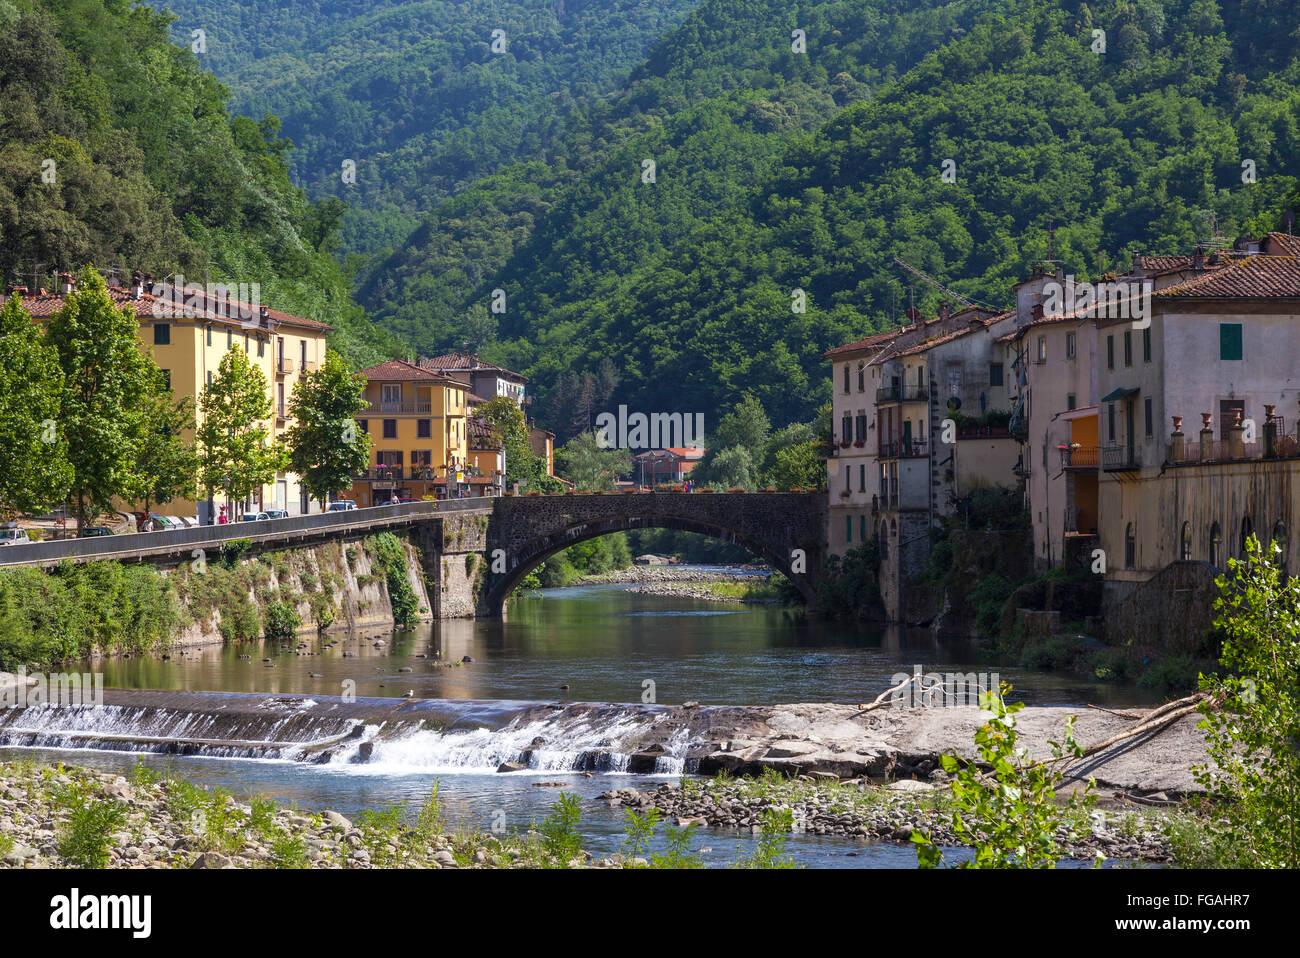 River through bagni di lucca italy stock photo 96119835 alamy - Bagni di lucca ...